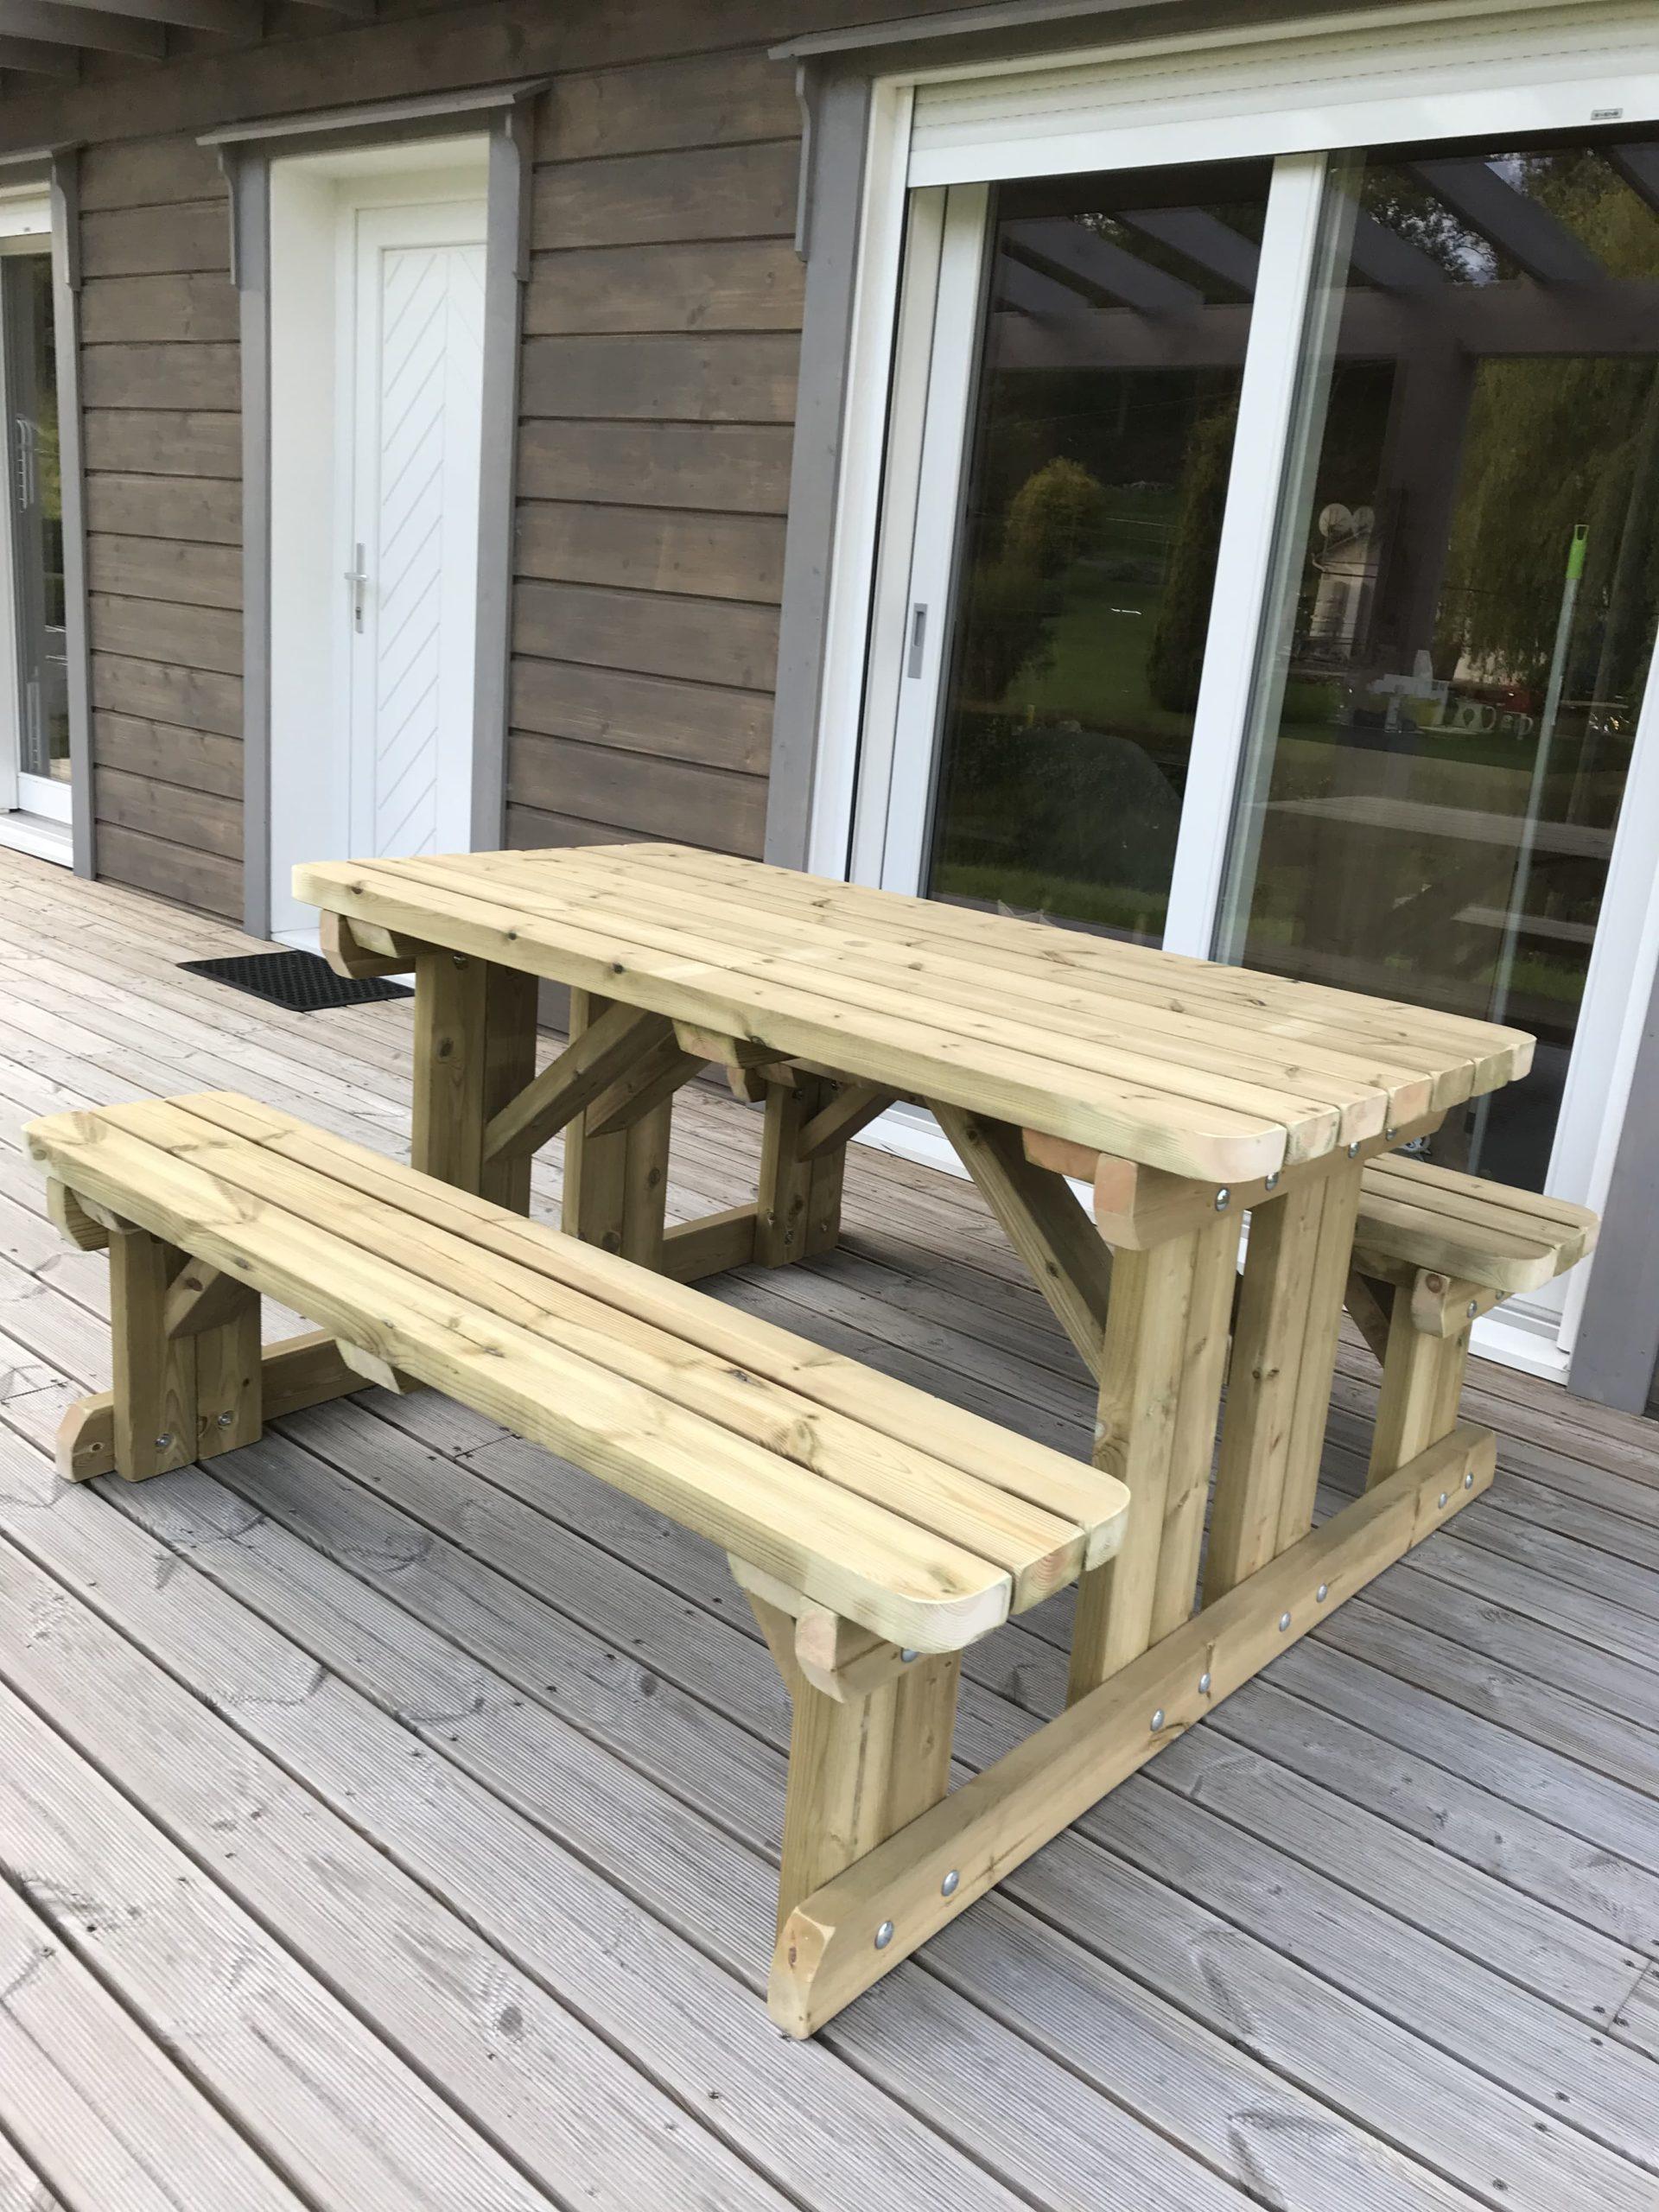 a walk in pub bench on wooden decking